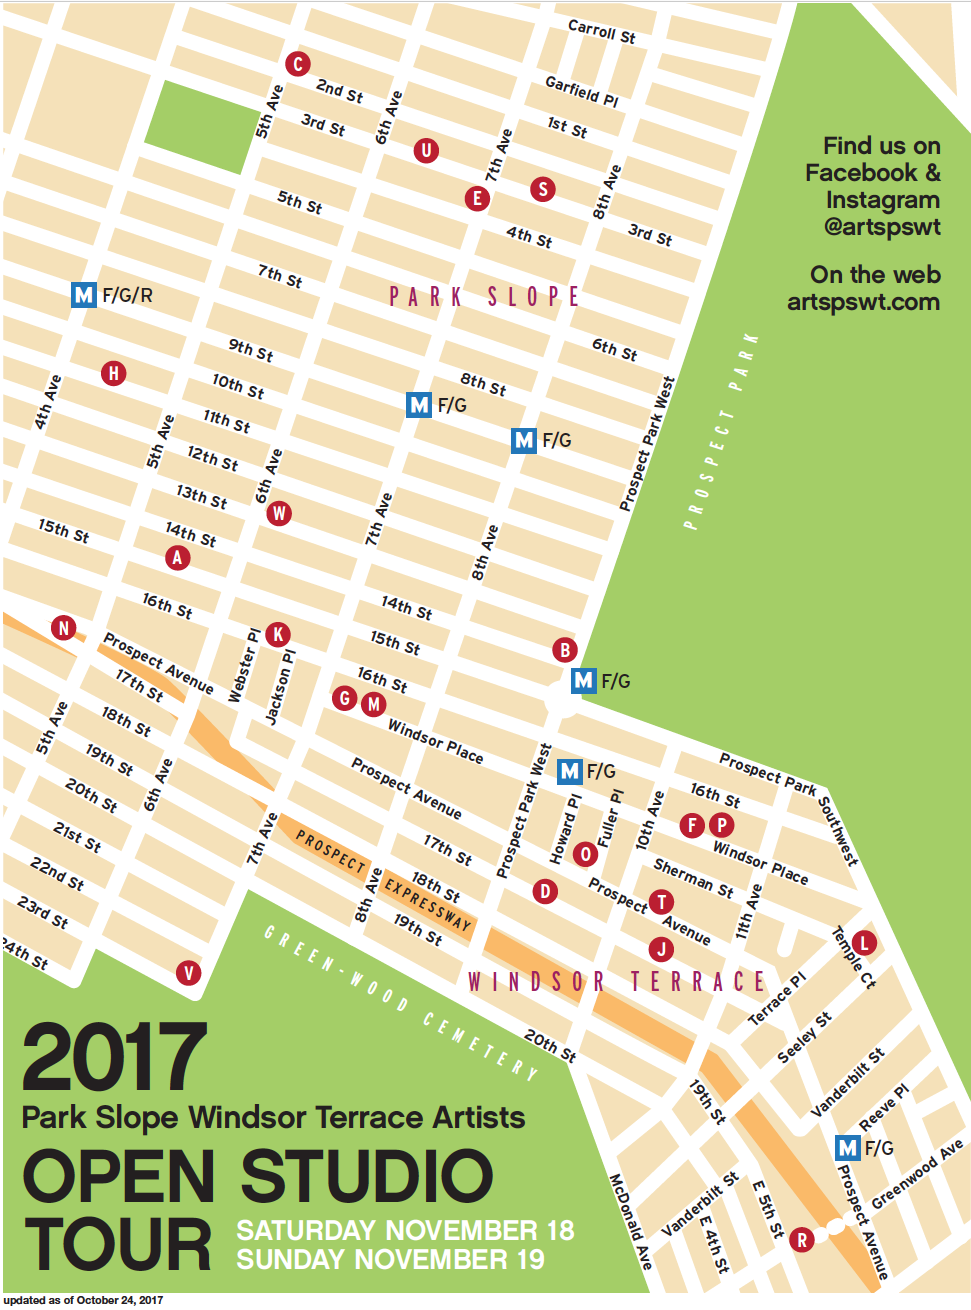 Open Studios Map PARK SLOPE WINDSOR TERRACE ARTISTS - Us open grounds map 2017